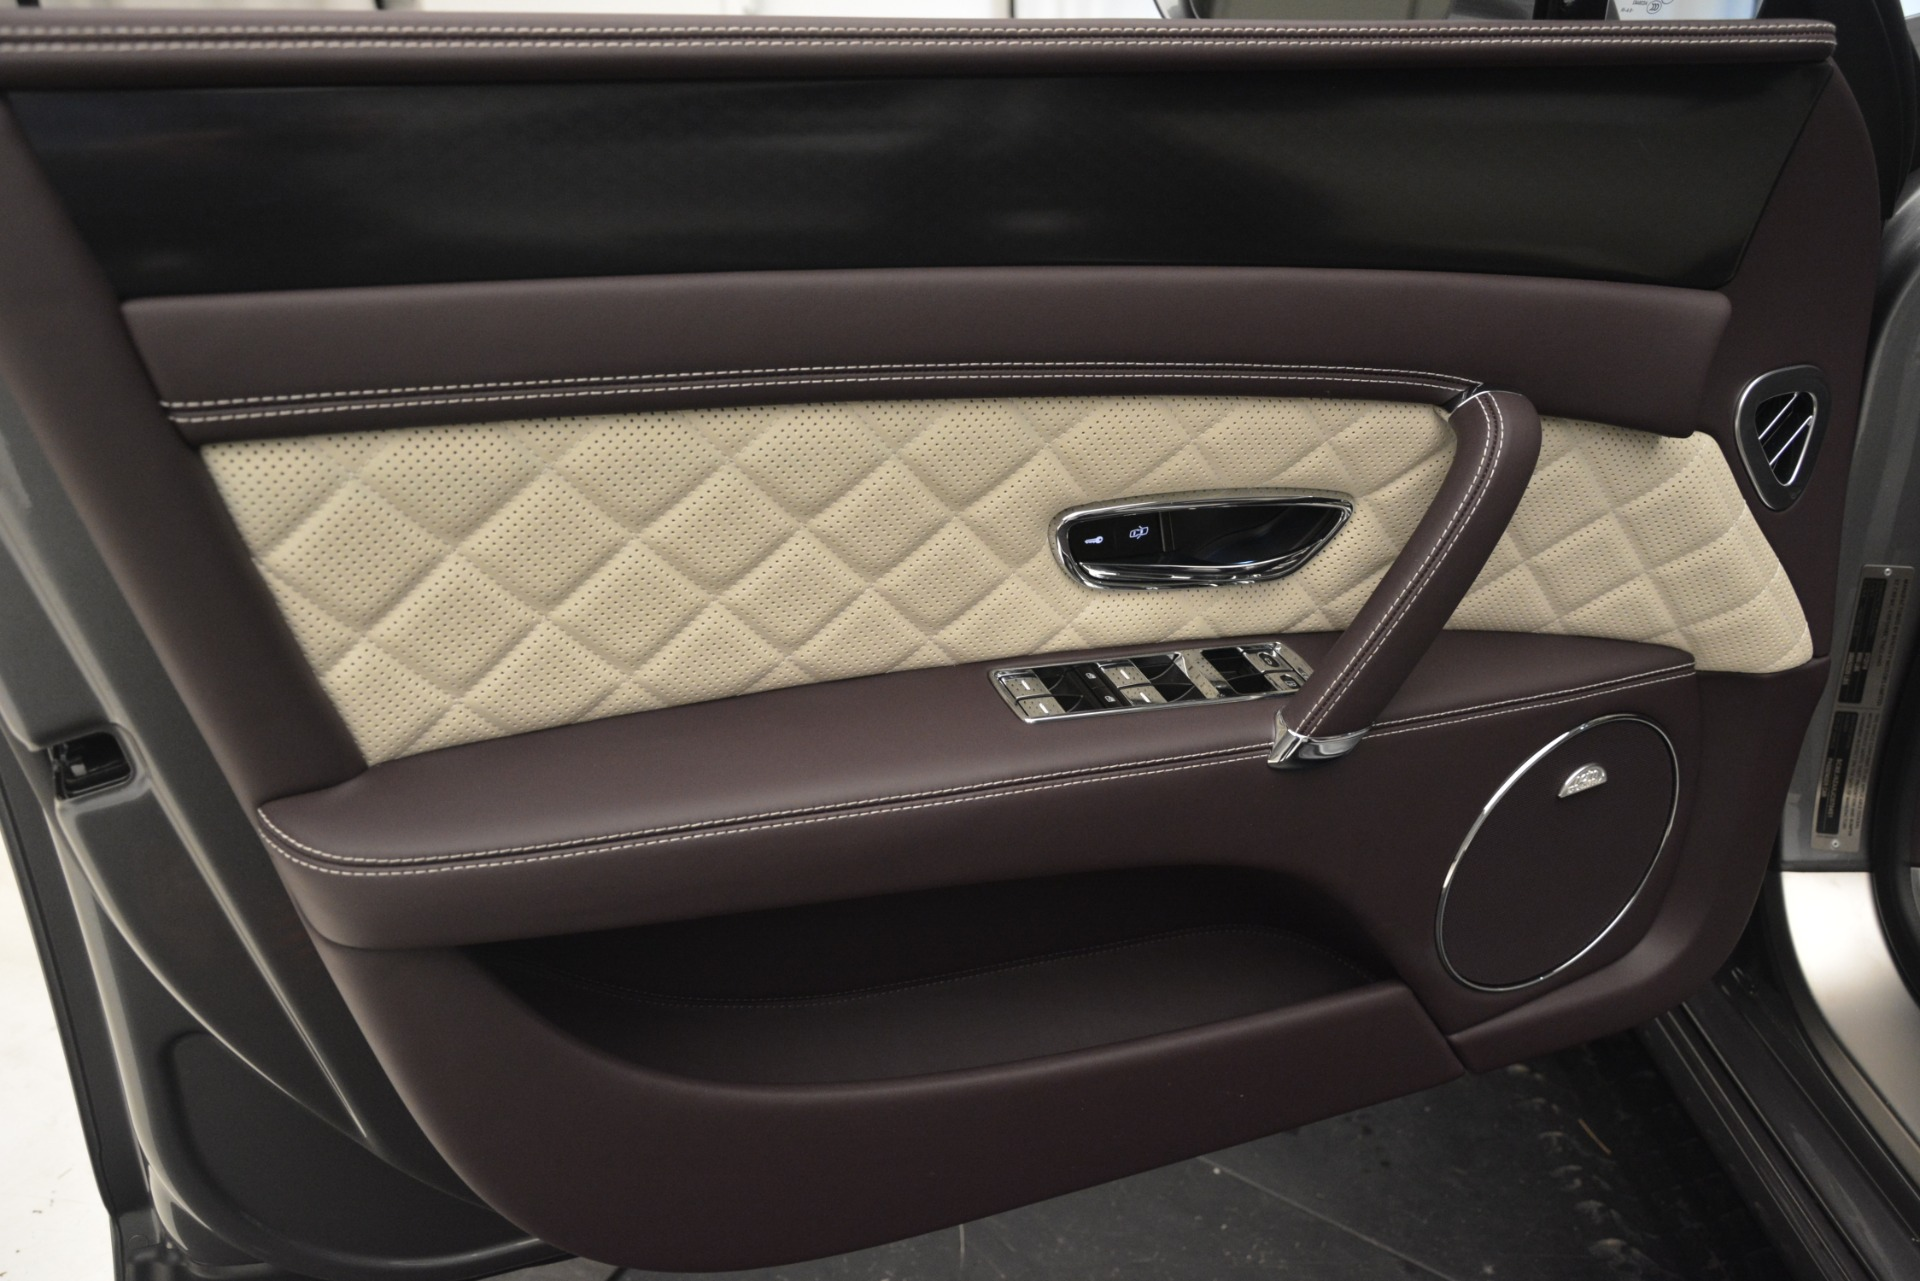 Used 2018 Bentley Flying Spur W12 S For Sale In Westport, CT 2973_p17